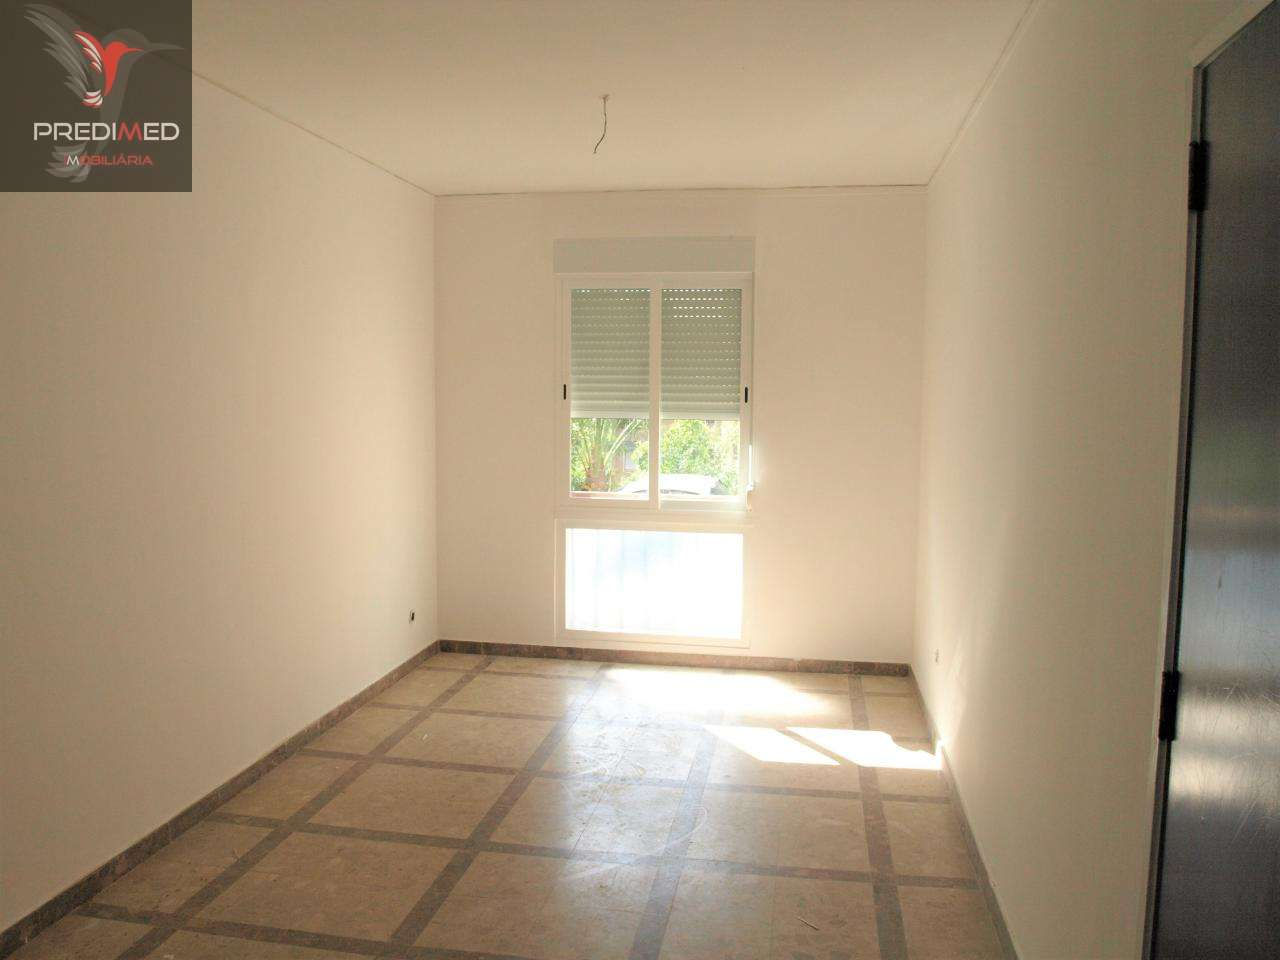 Apartamento para comprar, Santo António dos Cavaleiros e Frielas, Loures, Lisboa - Foto 1